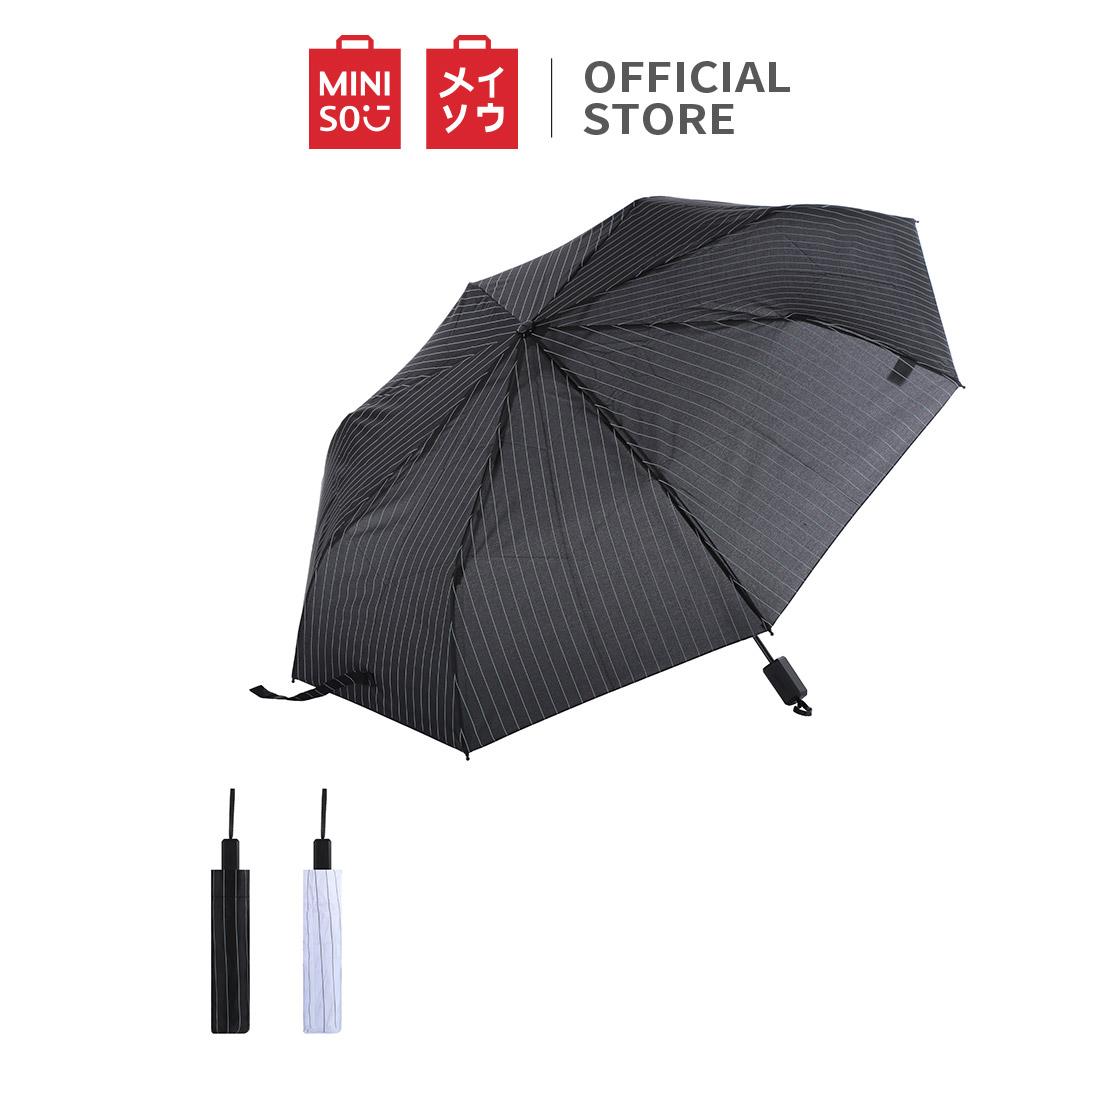 Dù gấp, sọc MinisoFoldable Umbrella